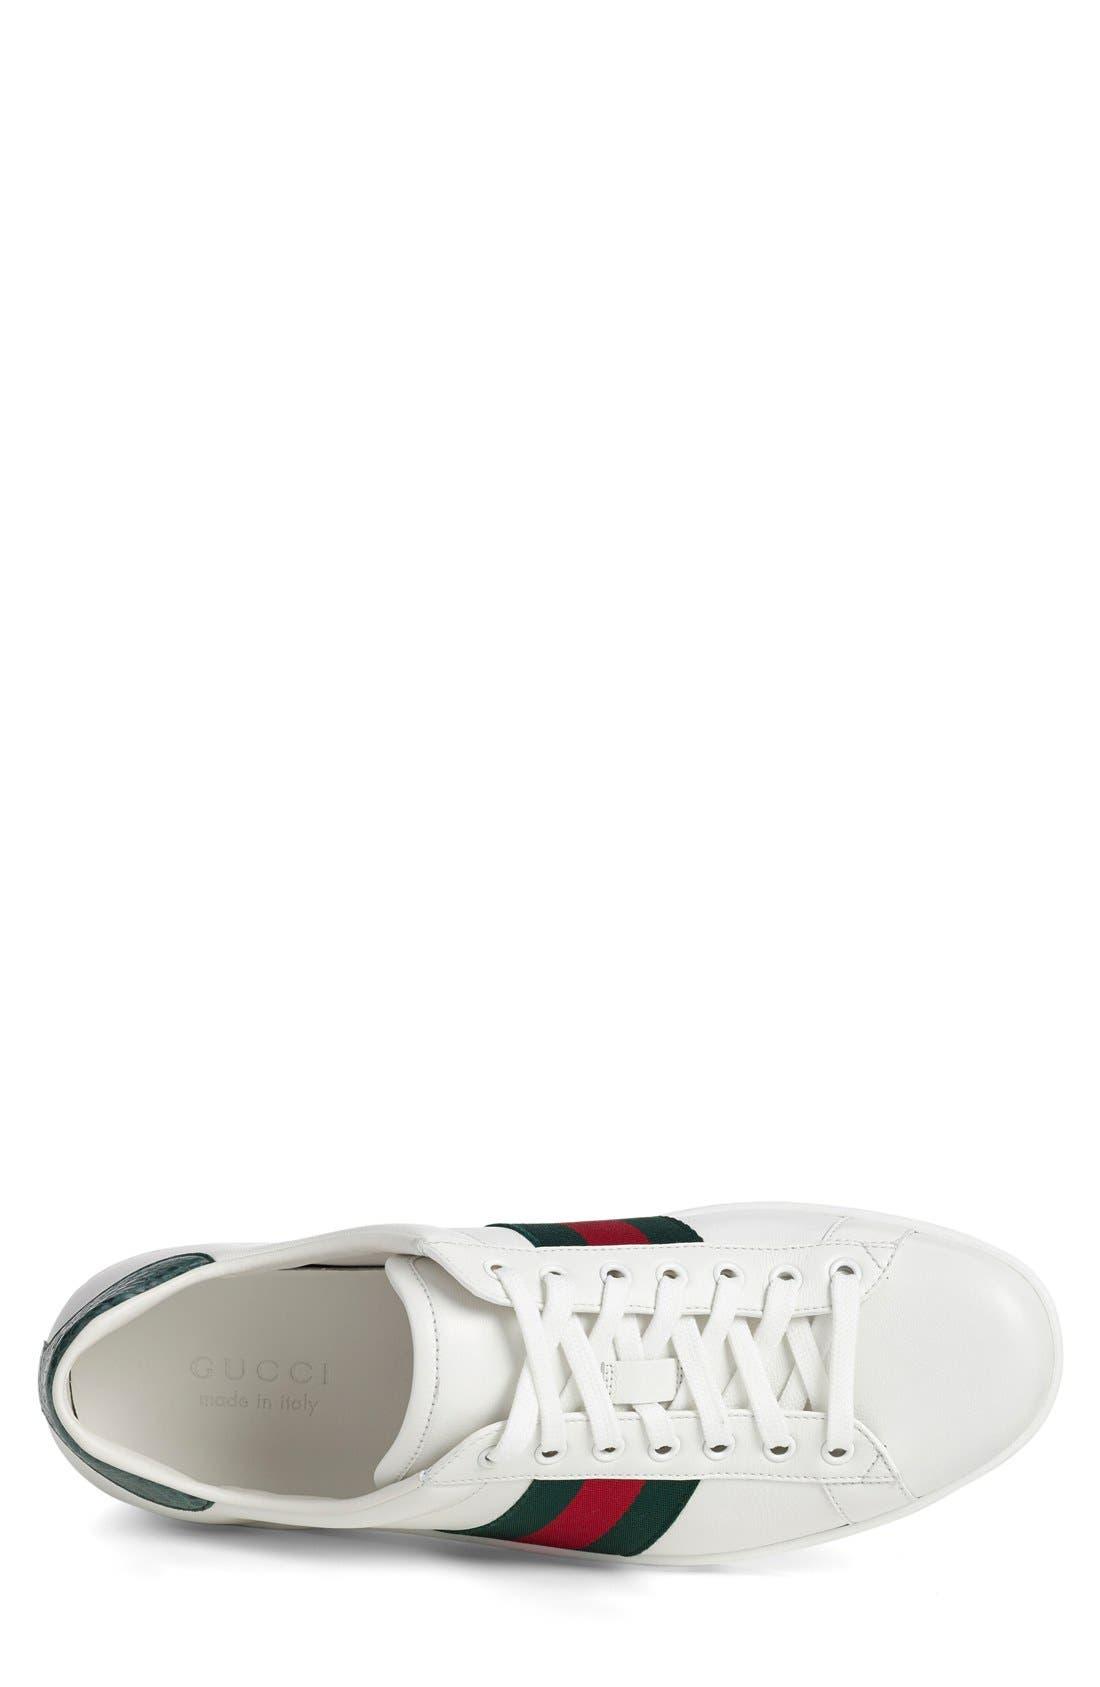 Alternate Image 3  - Gucci New Ace Sneaker (Men)